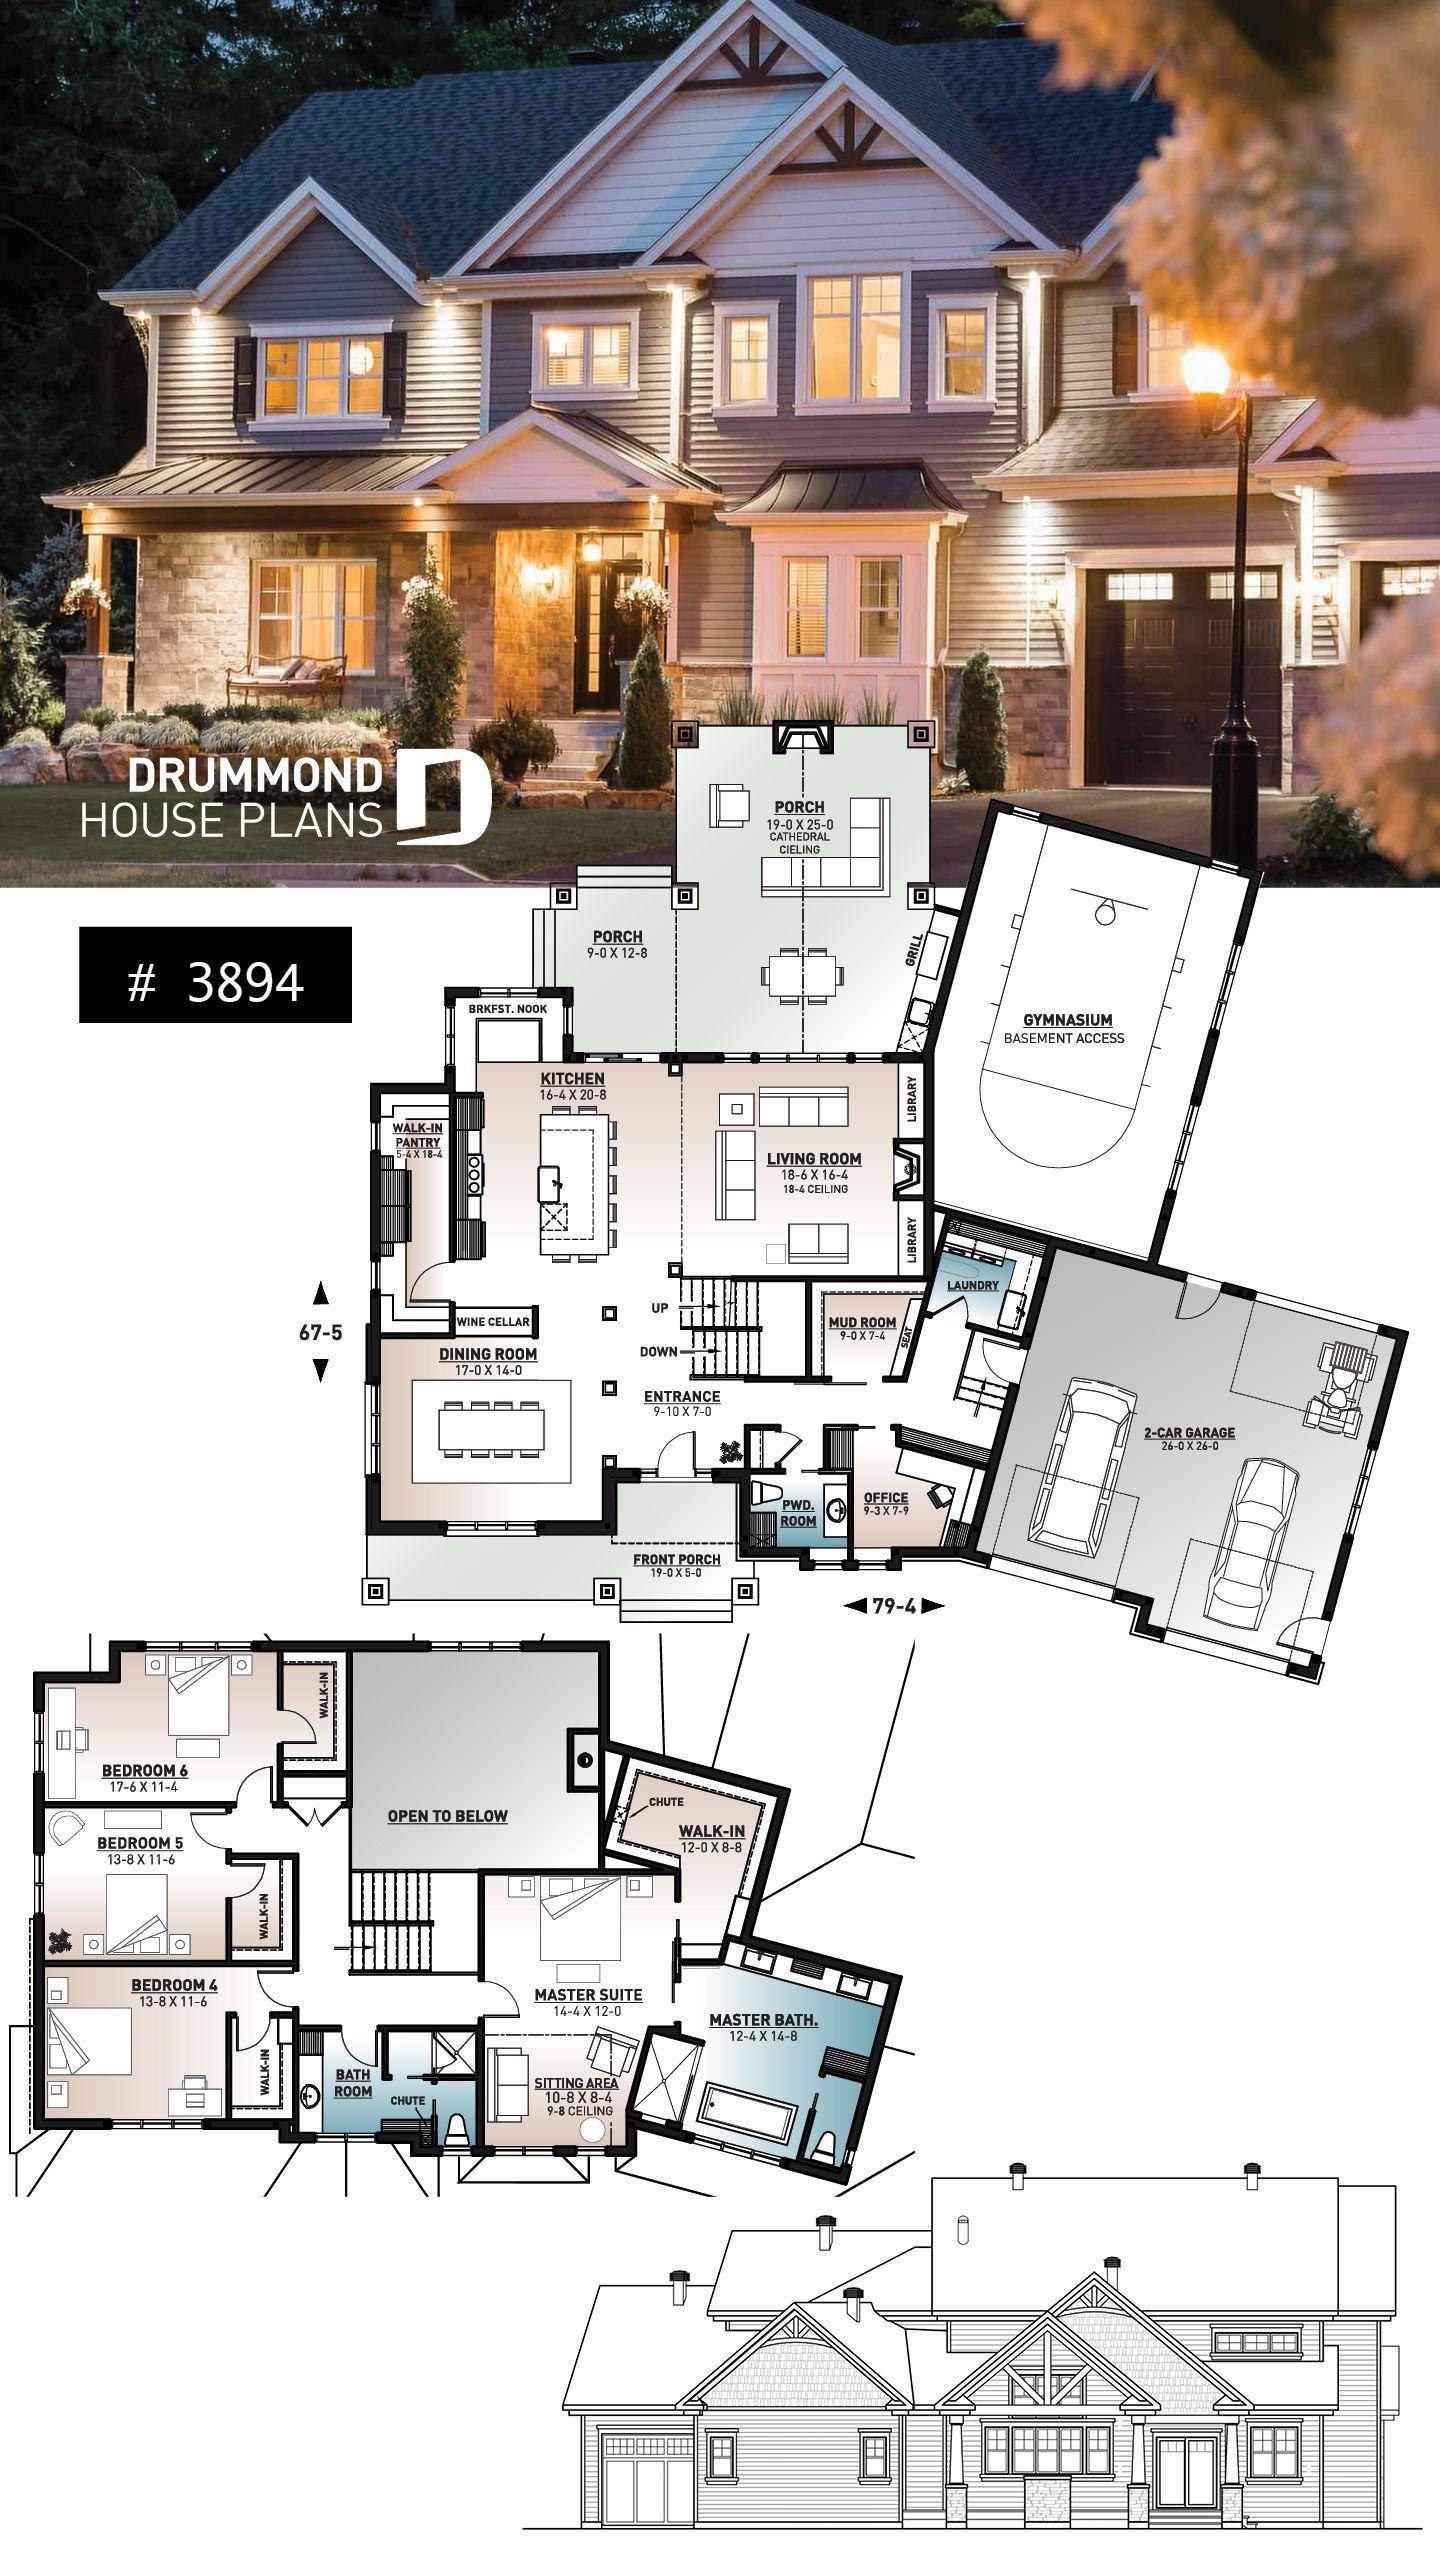 Melhores Dicas De Reforma E Decoracao Architectural Design House Plans House Plans Farmhouse Modern House Plans